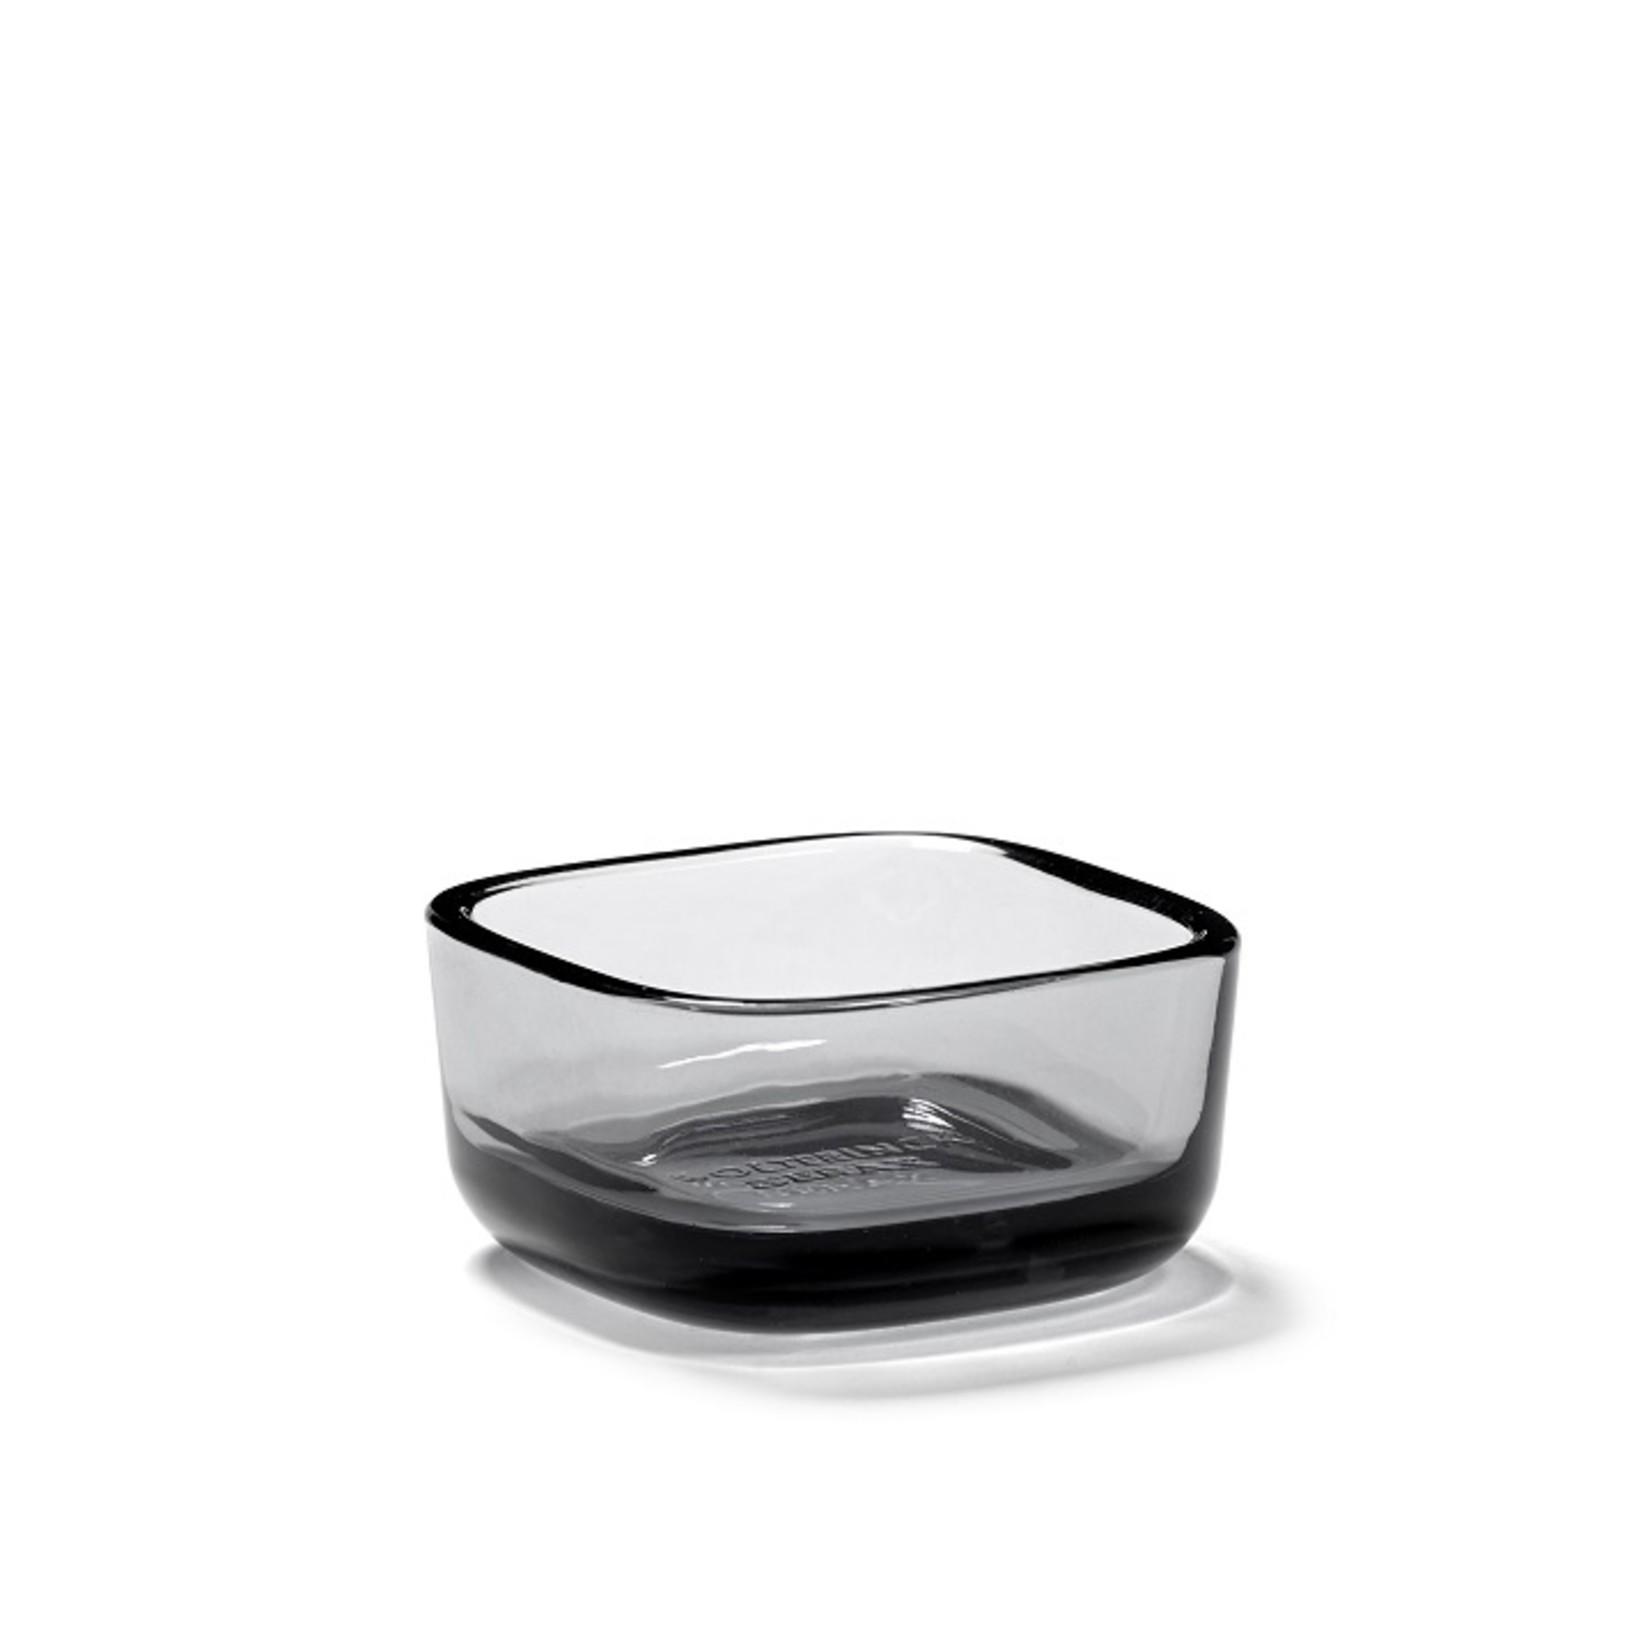 SERAX SQUARE BOWL HIGH GLASS M HEII